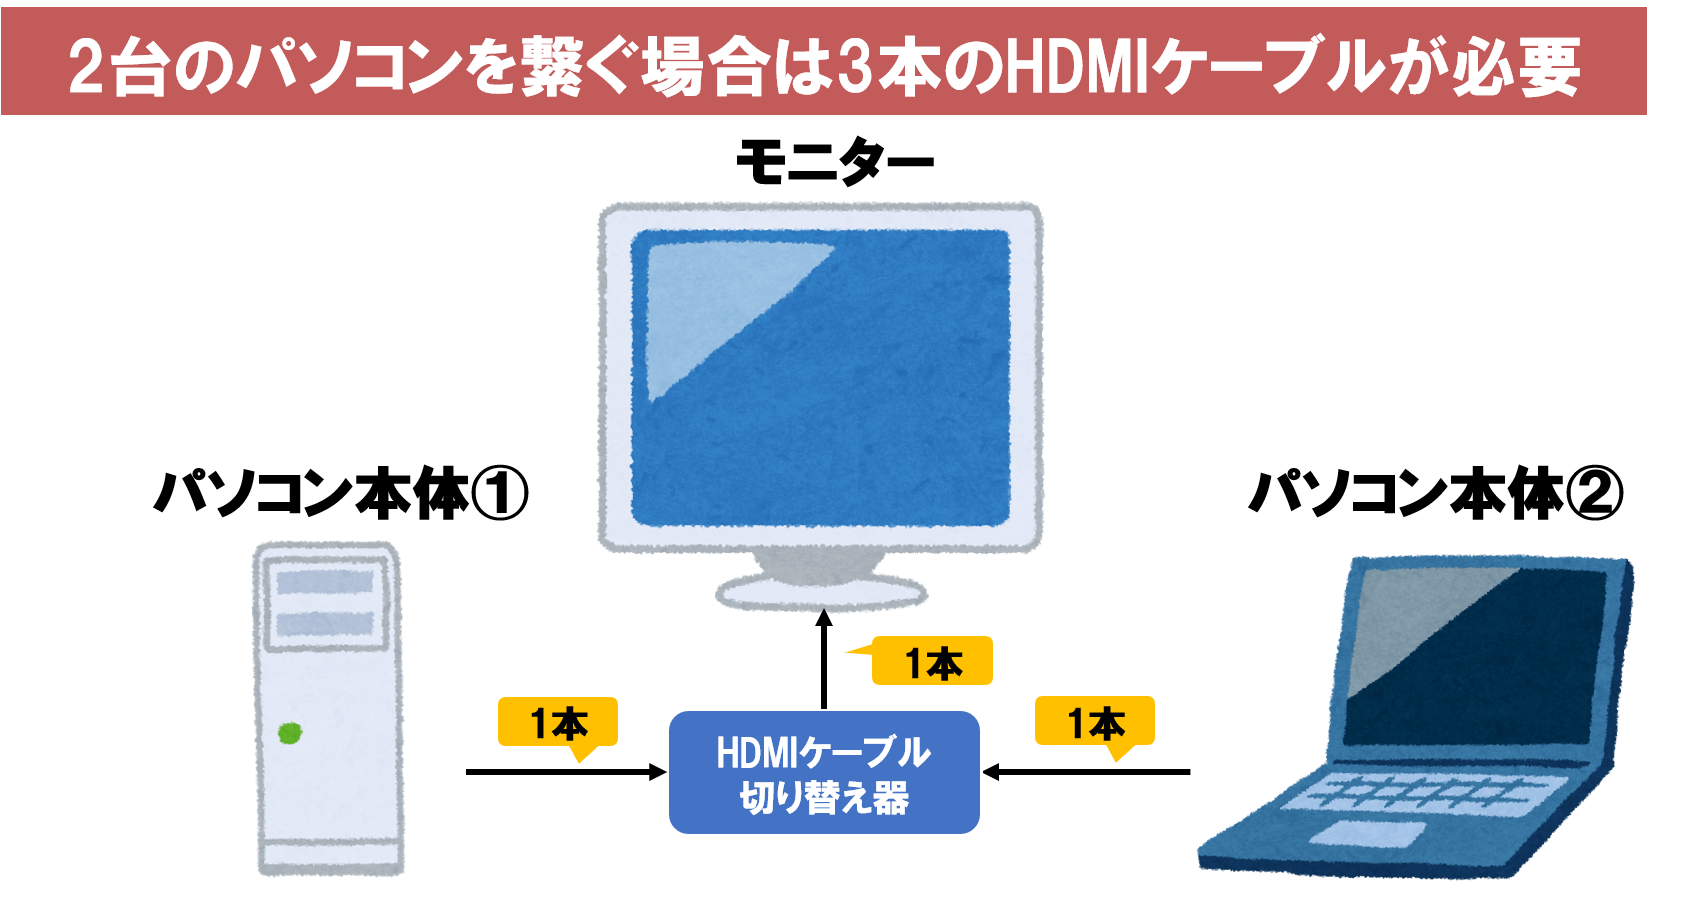 HDMI切り替え機はHDMIケーブルが複数必要